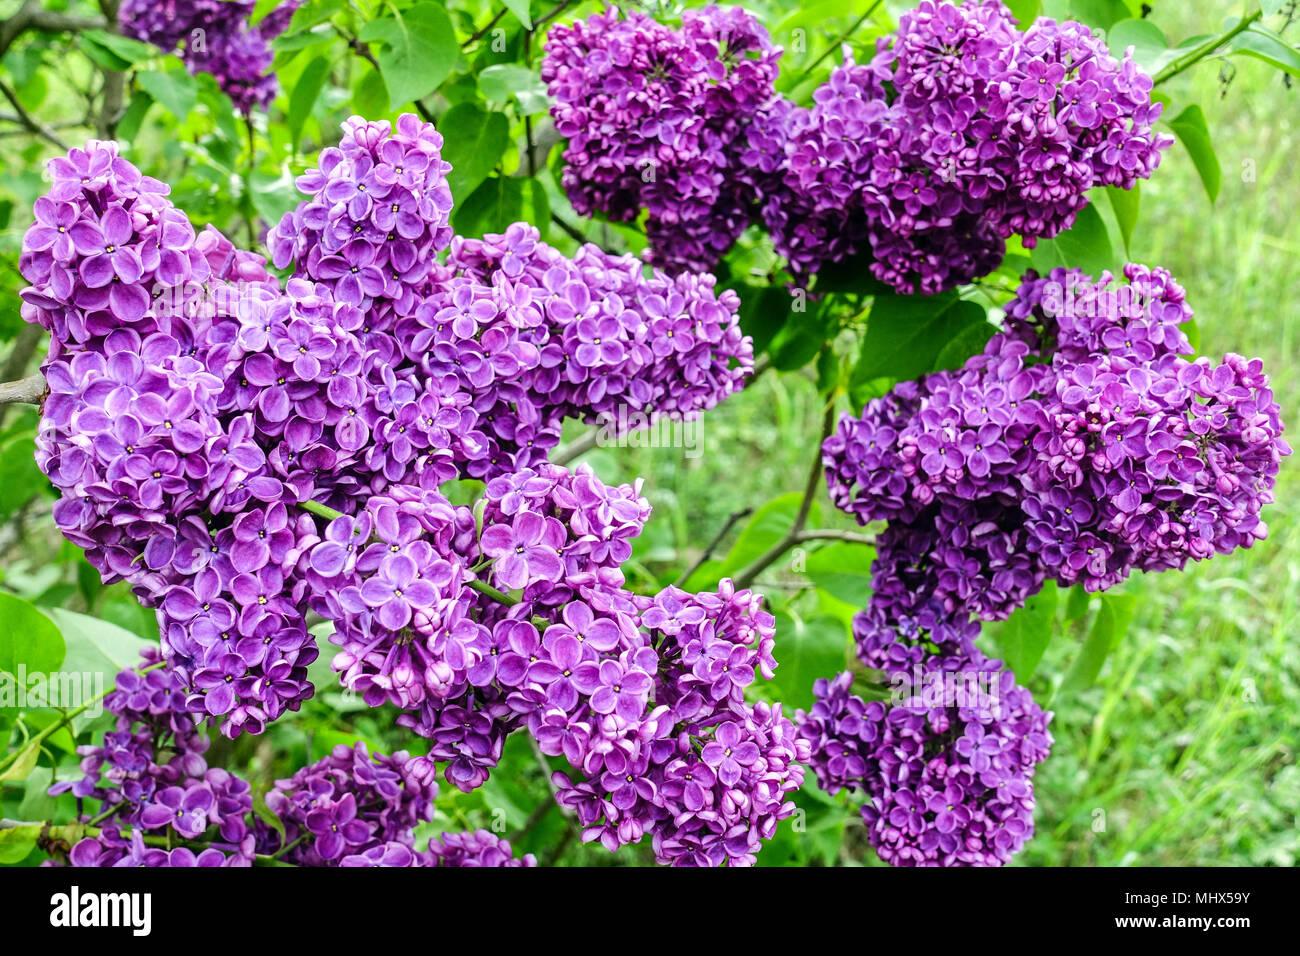 Purple Lilac flower, Syringa vulgaris Charles Joly - Stock Image